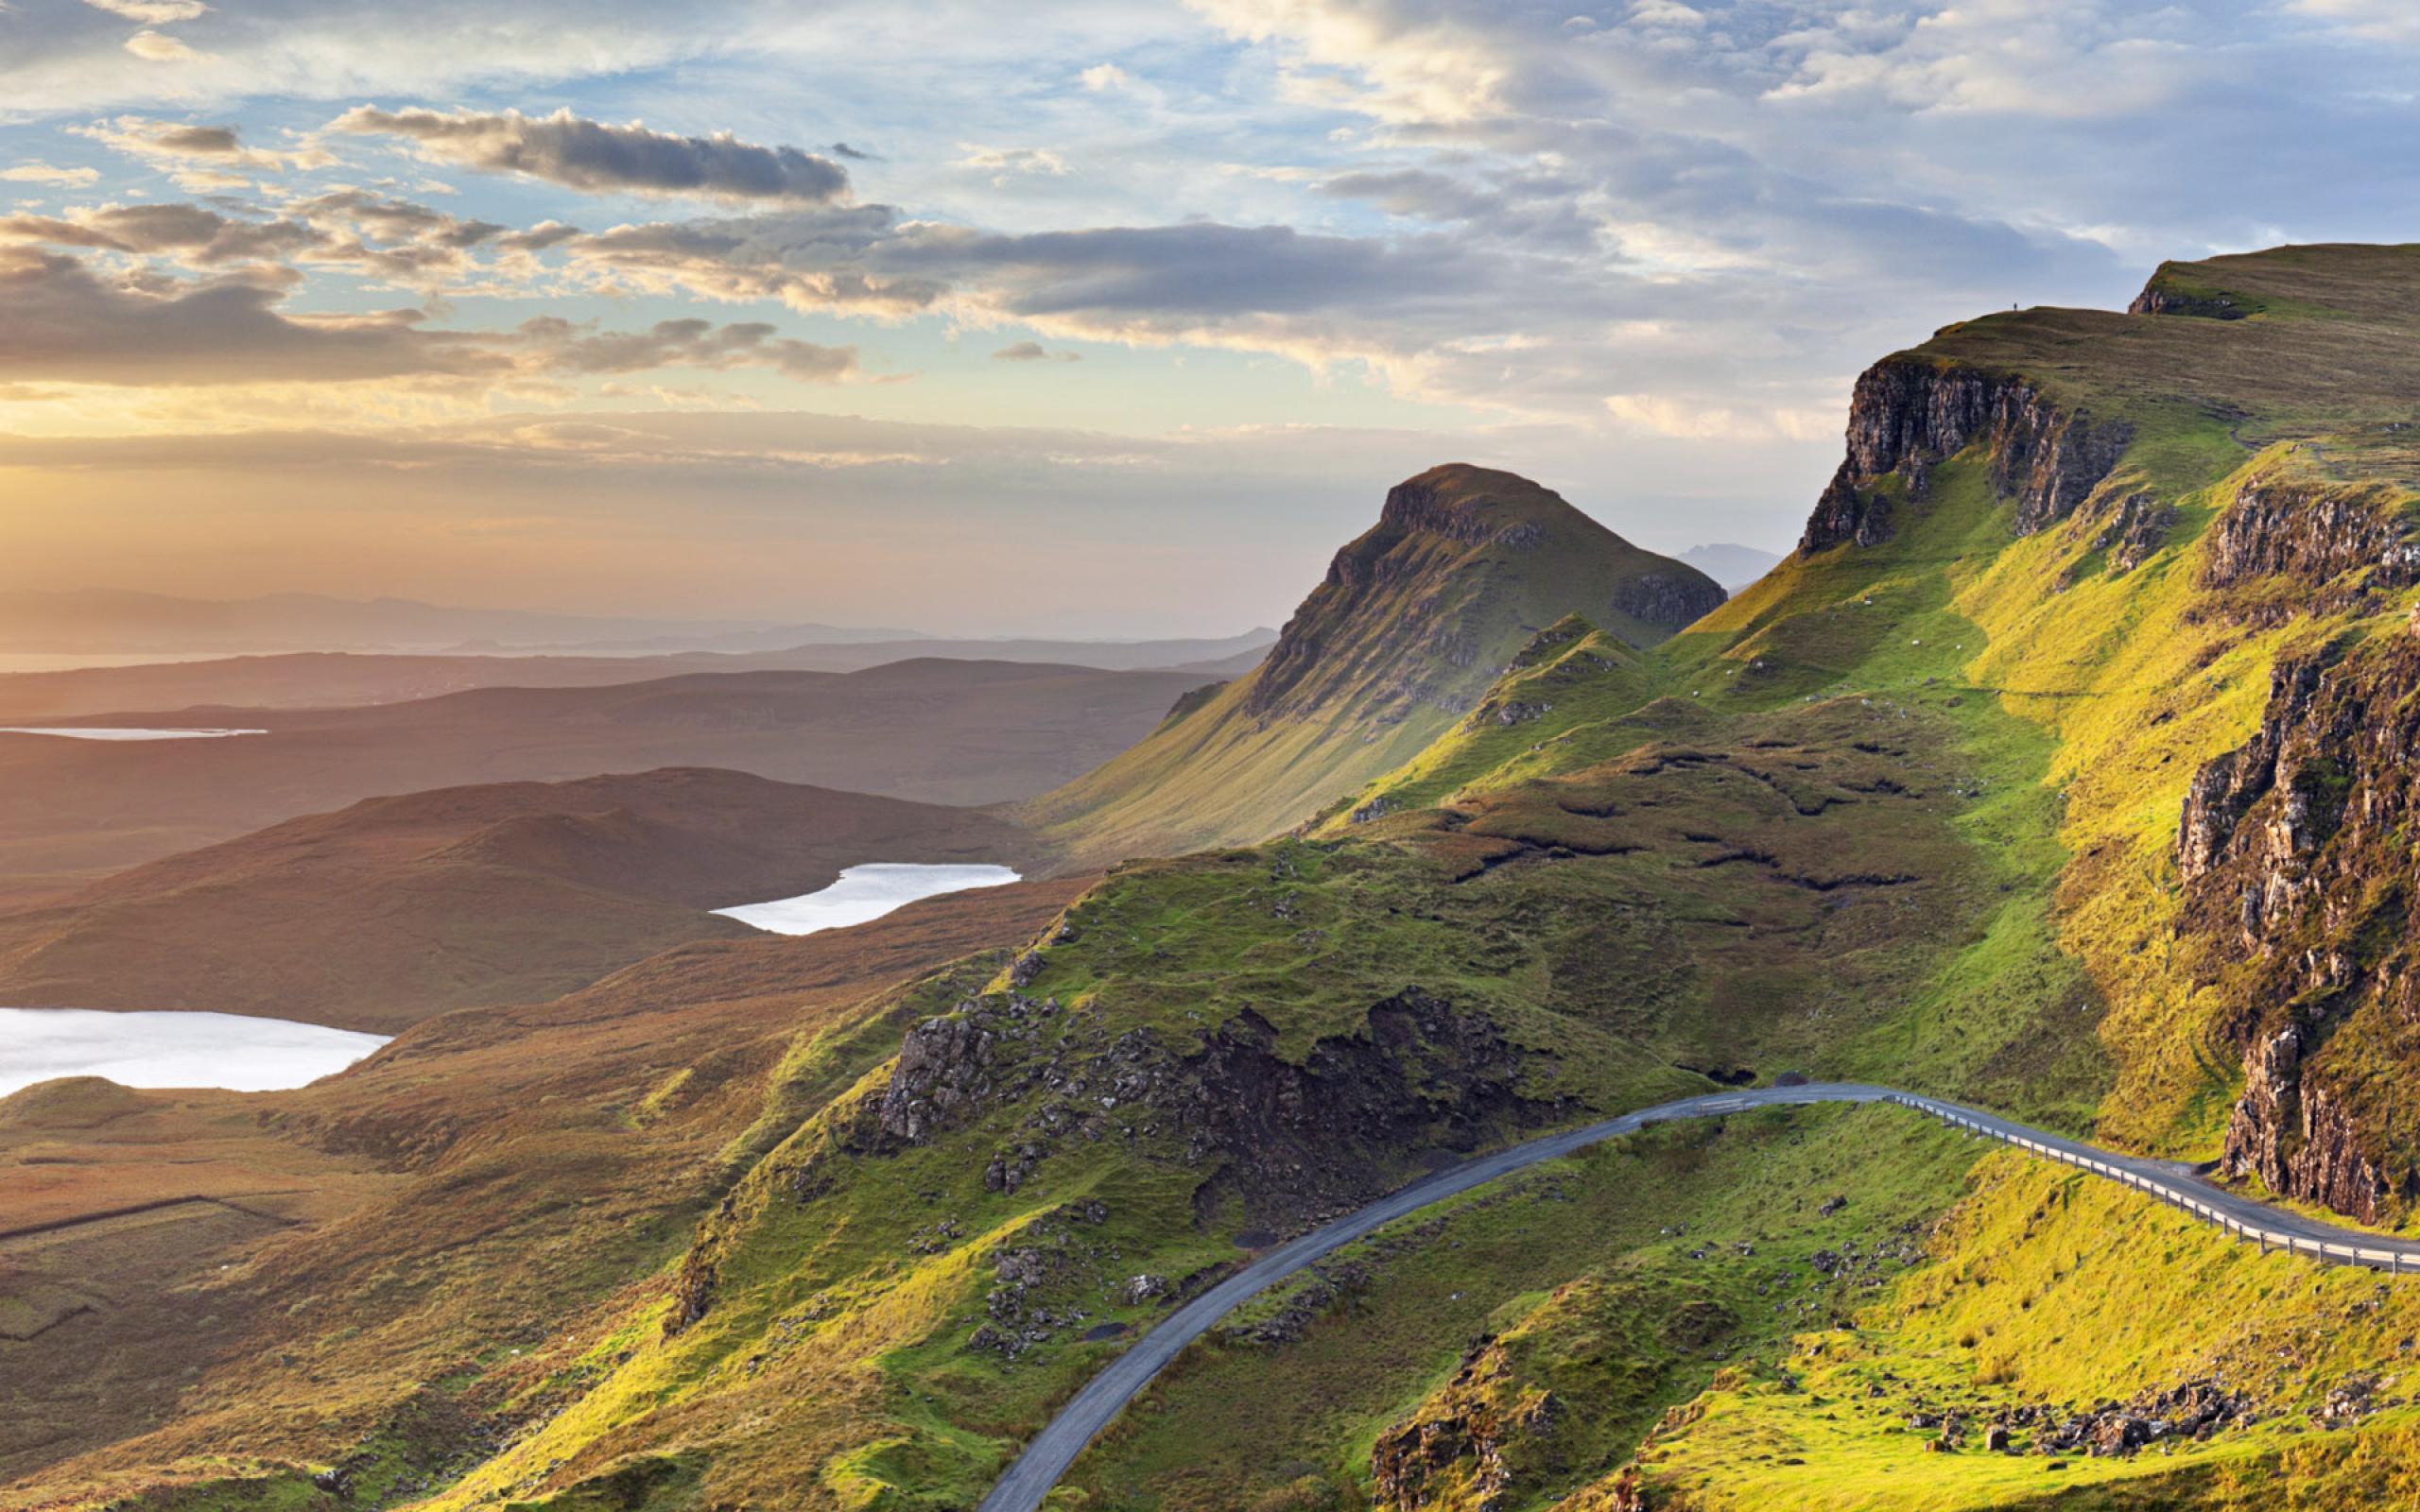 Scotland landscape wallpaper 2560x1600 27364 - Scotland wallpaper ...